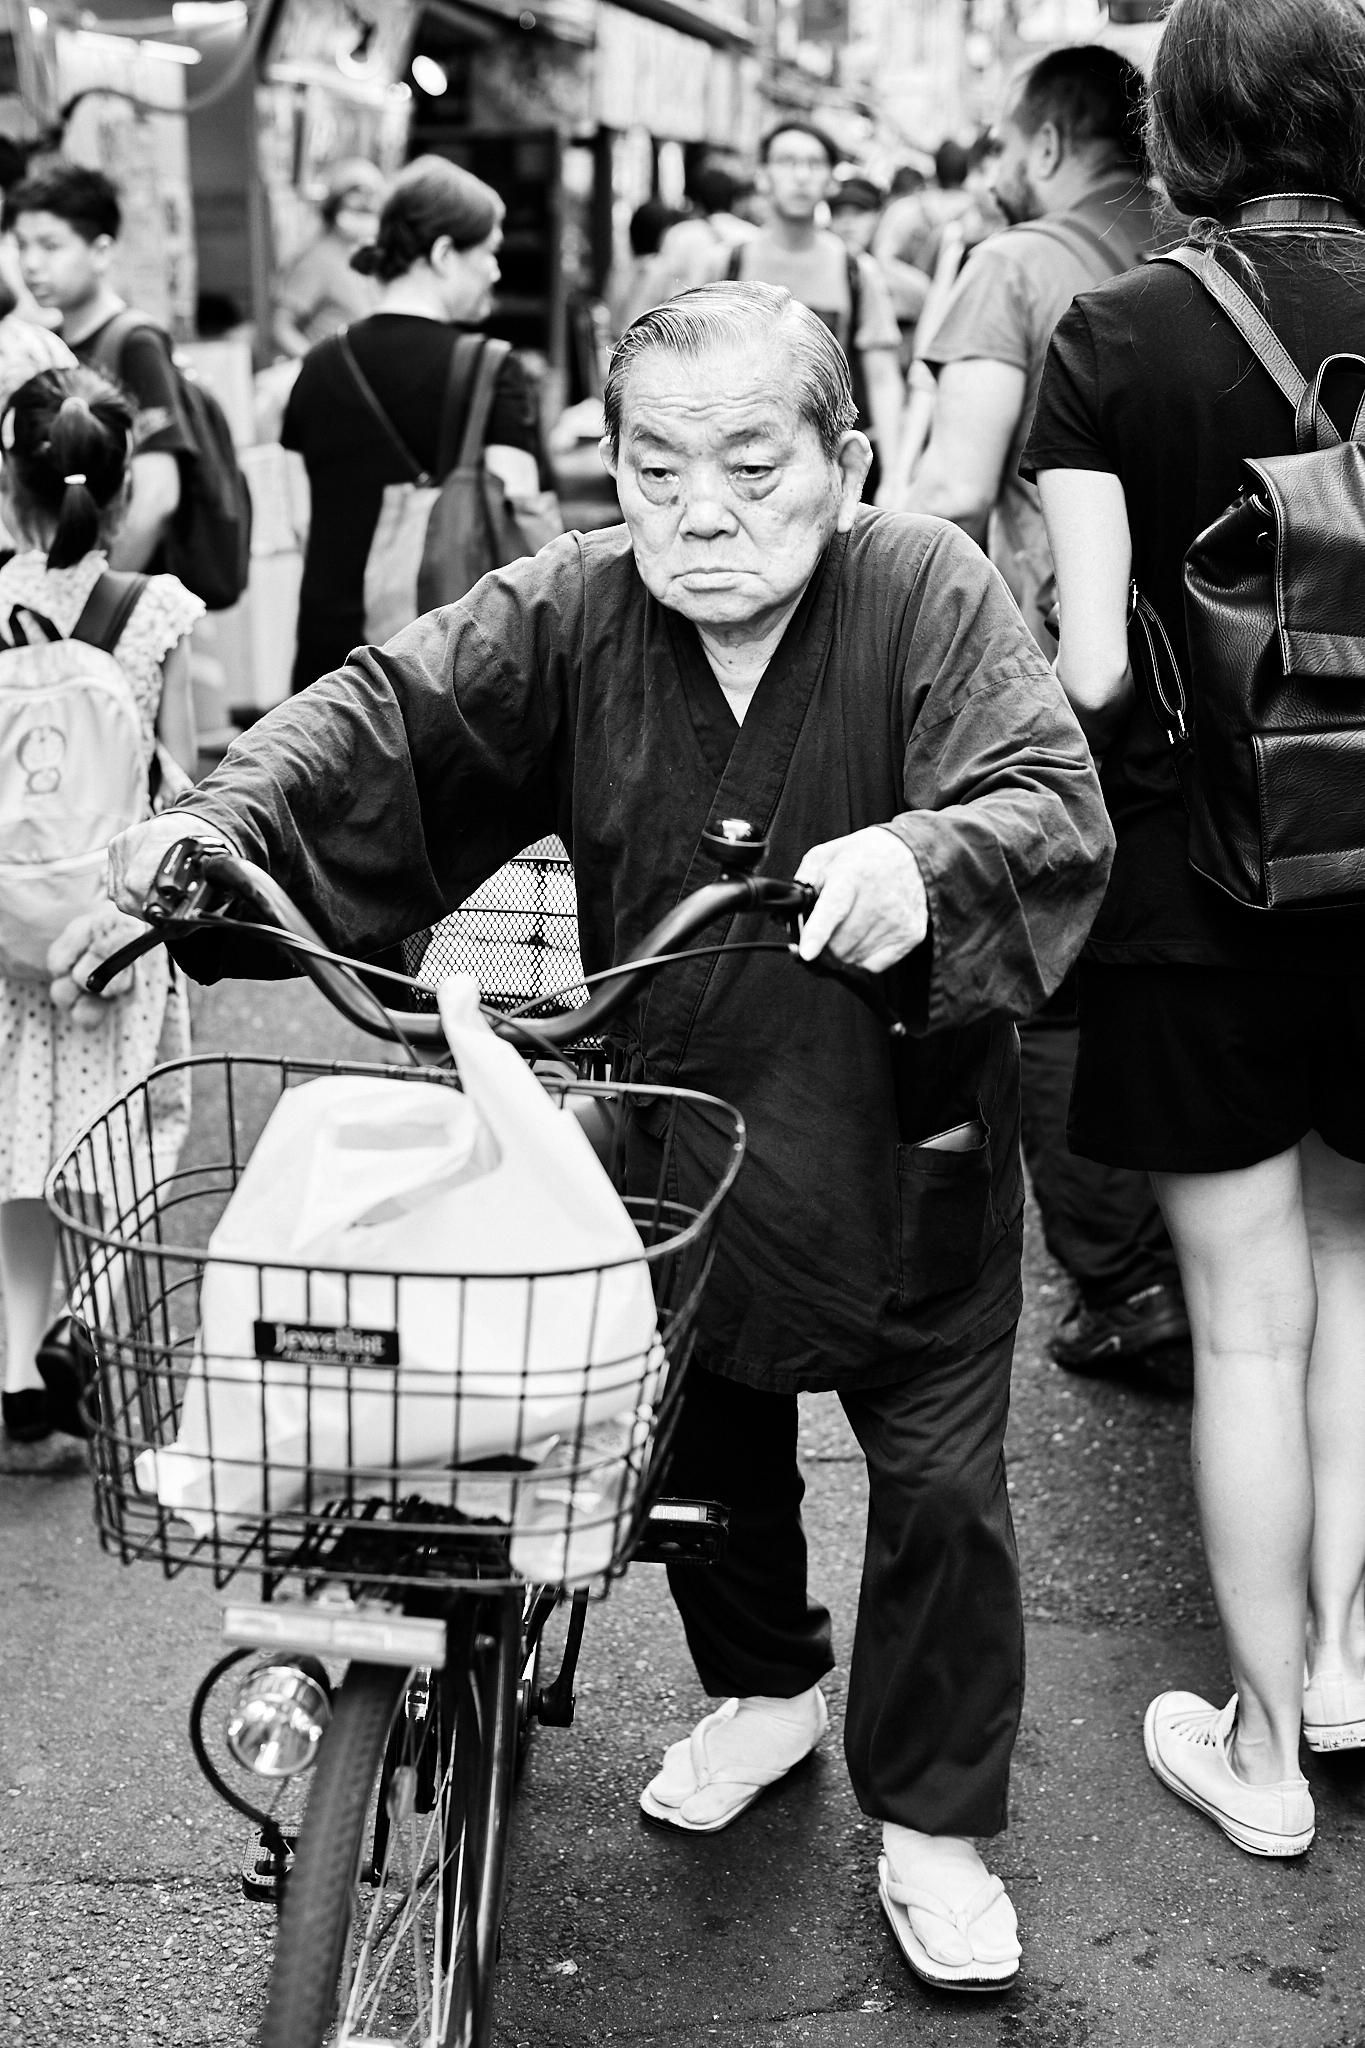 SnapPilots_17-07-05_Tokyo2017_bnw_66.jpg